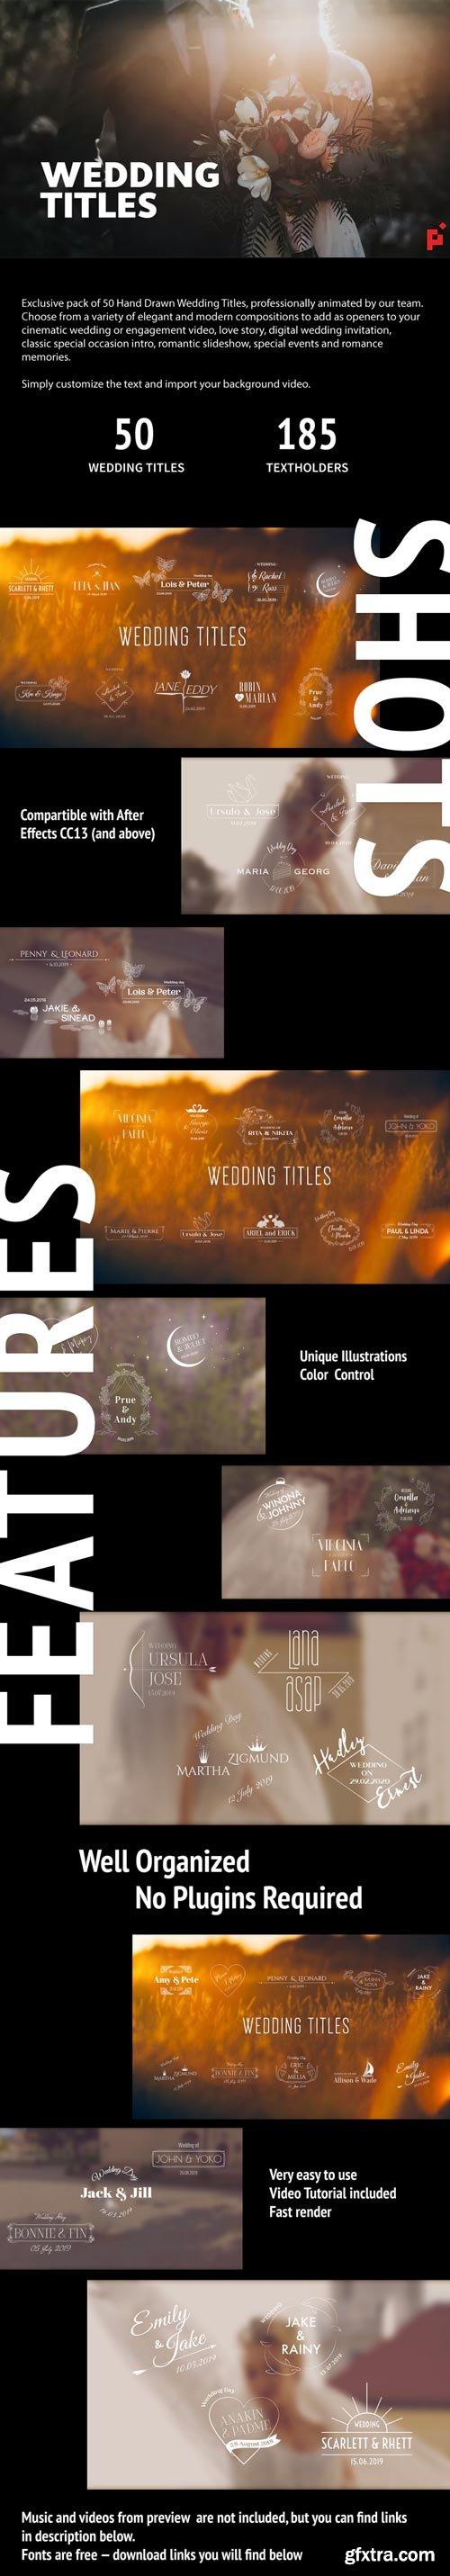 Videohive - 50 Wedding Titles - 23195625